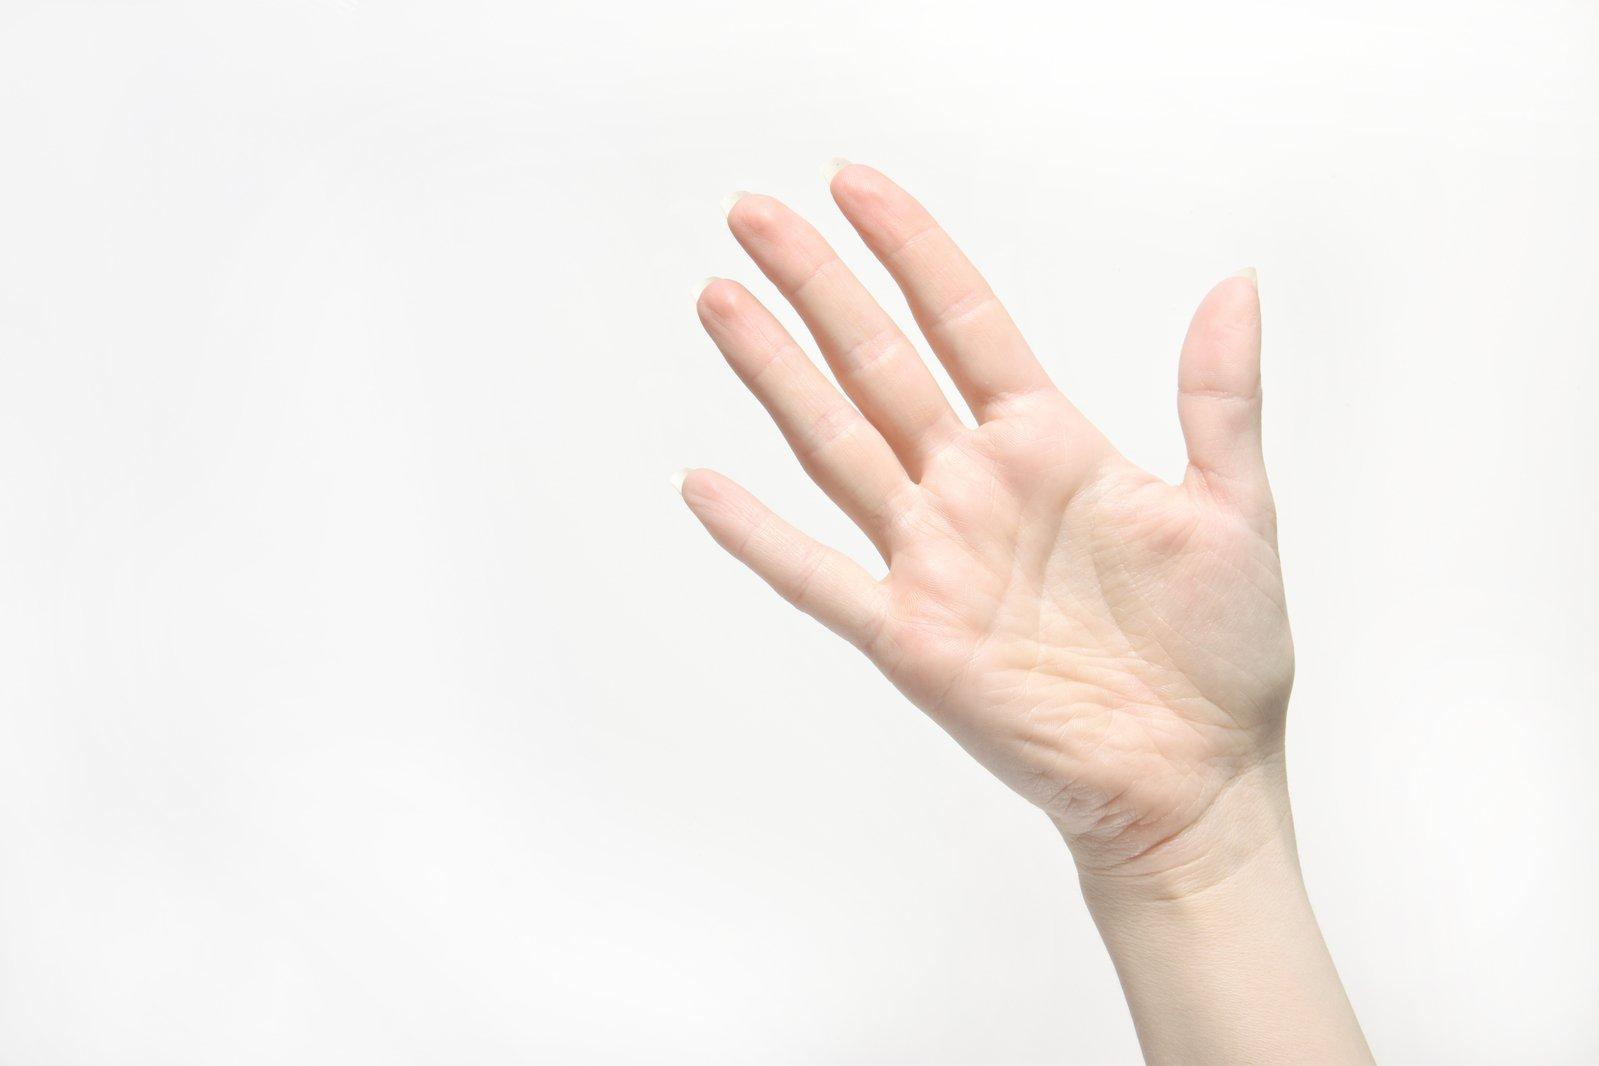 Free Waving Hand Stock Photo - FreeImages.com